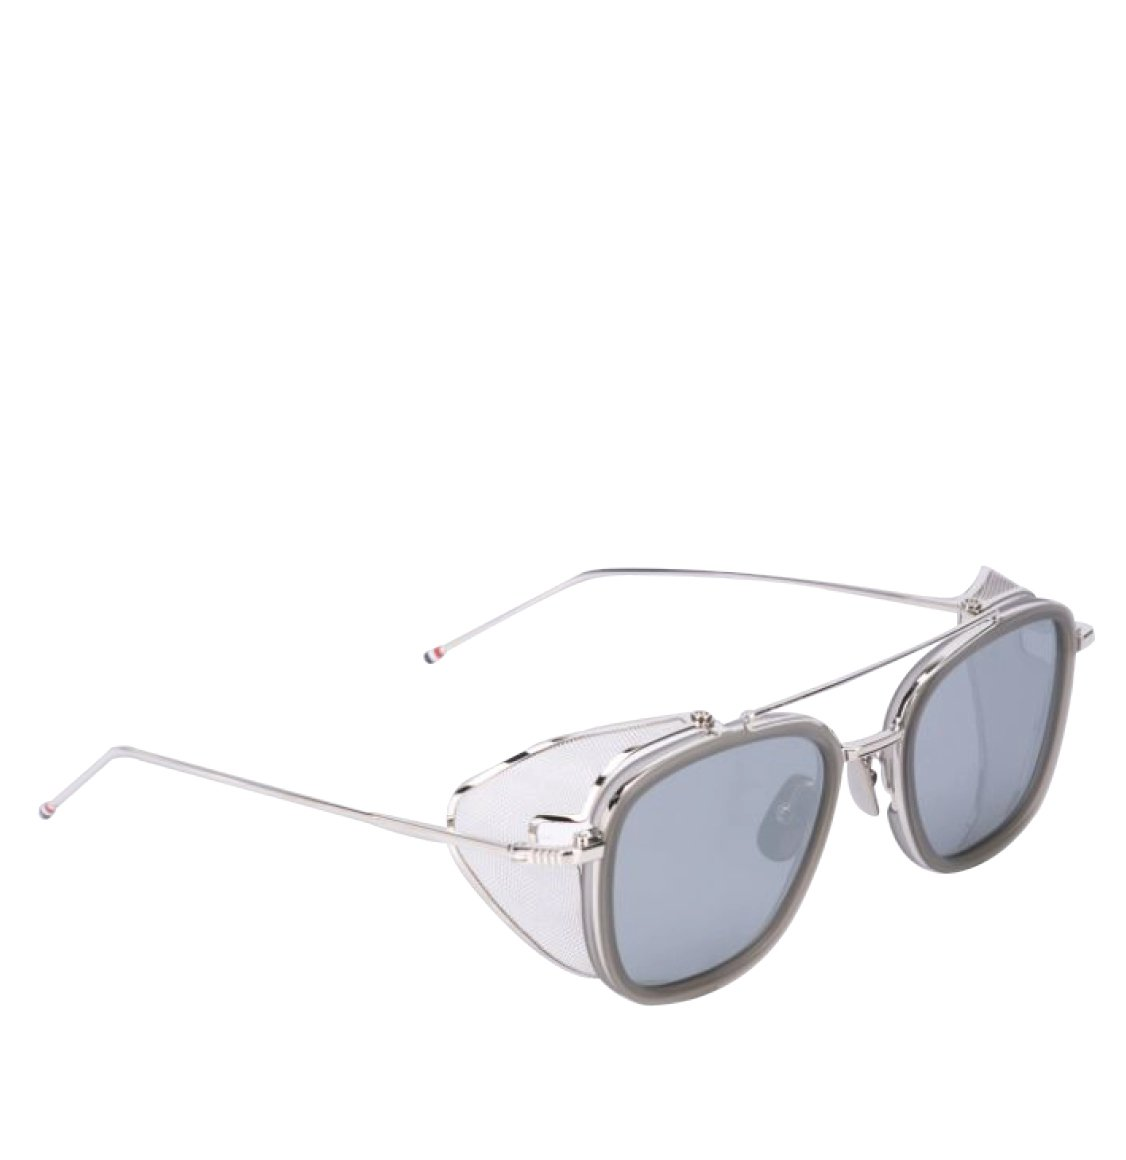 Thom Browne 51 Grey Silver Aviator Sunglasses Γυαλιά Ηλίου